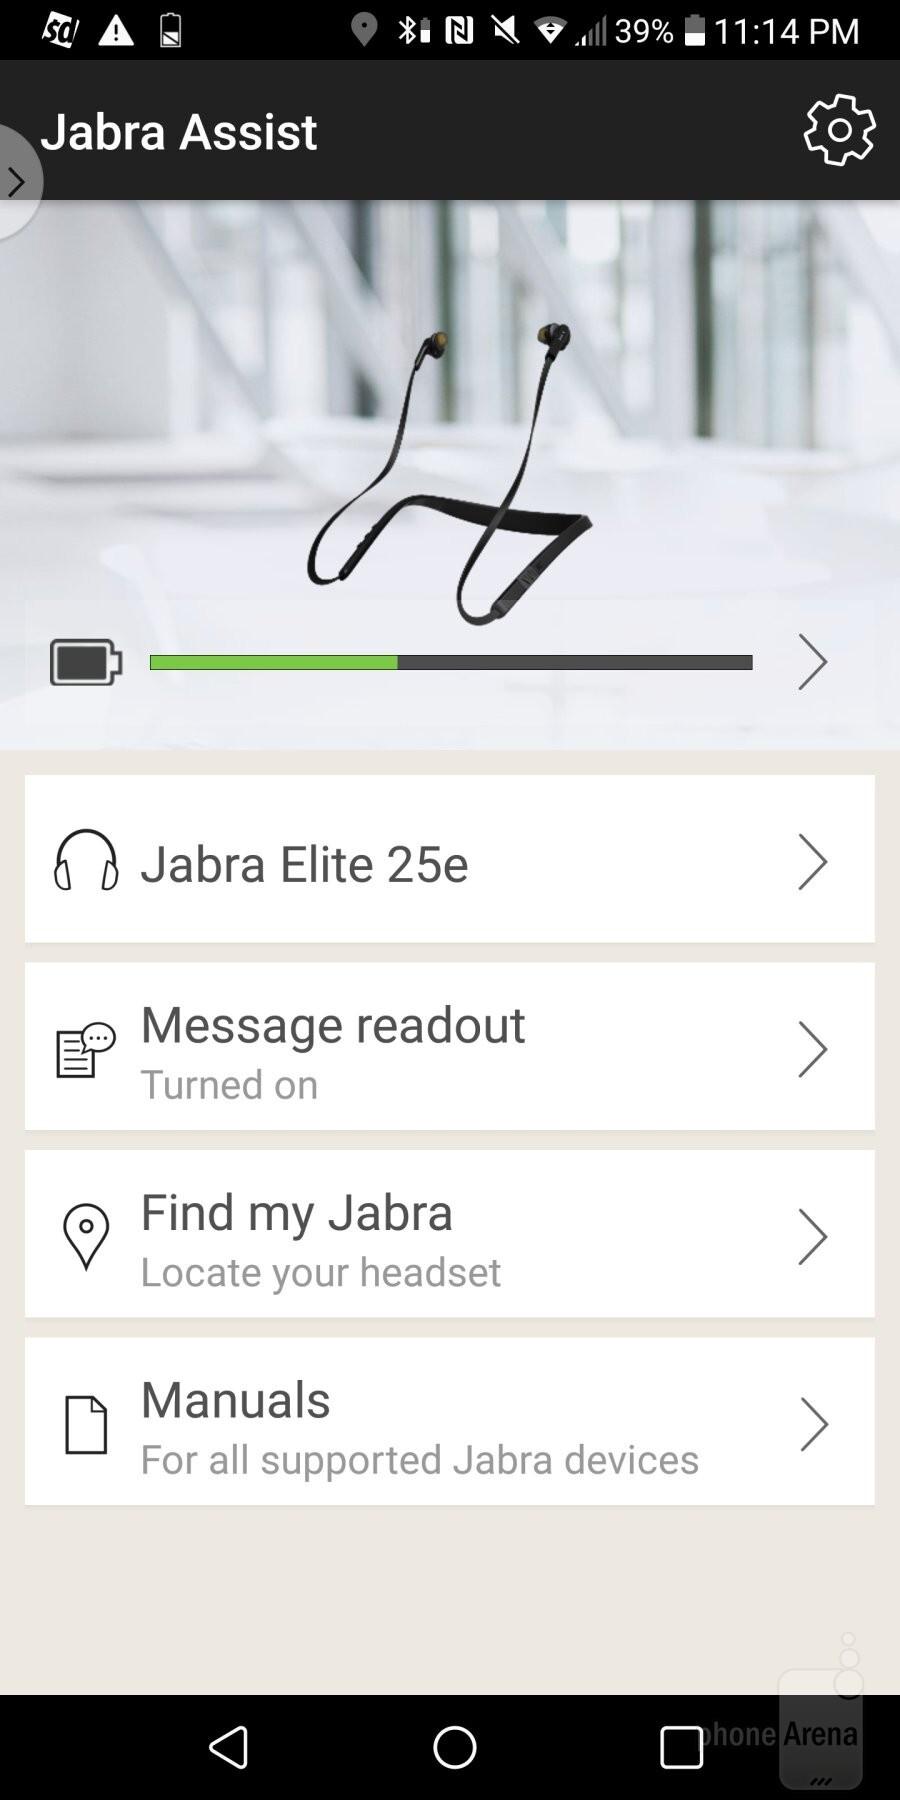 The Jabra Assist app